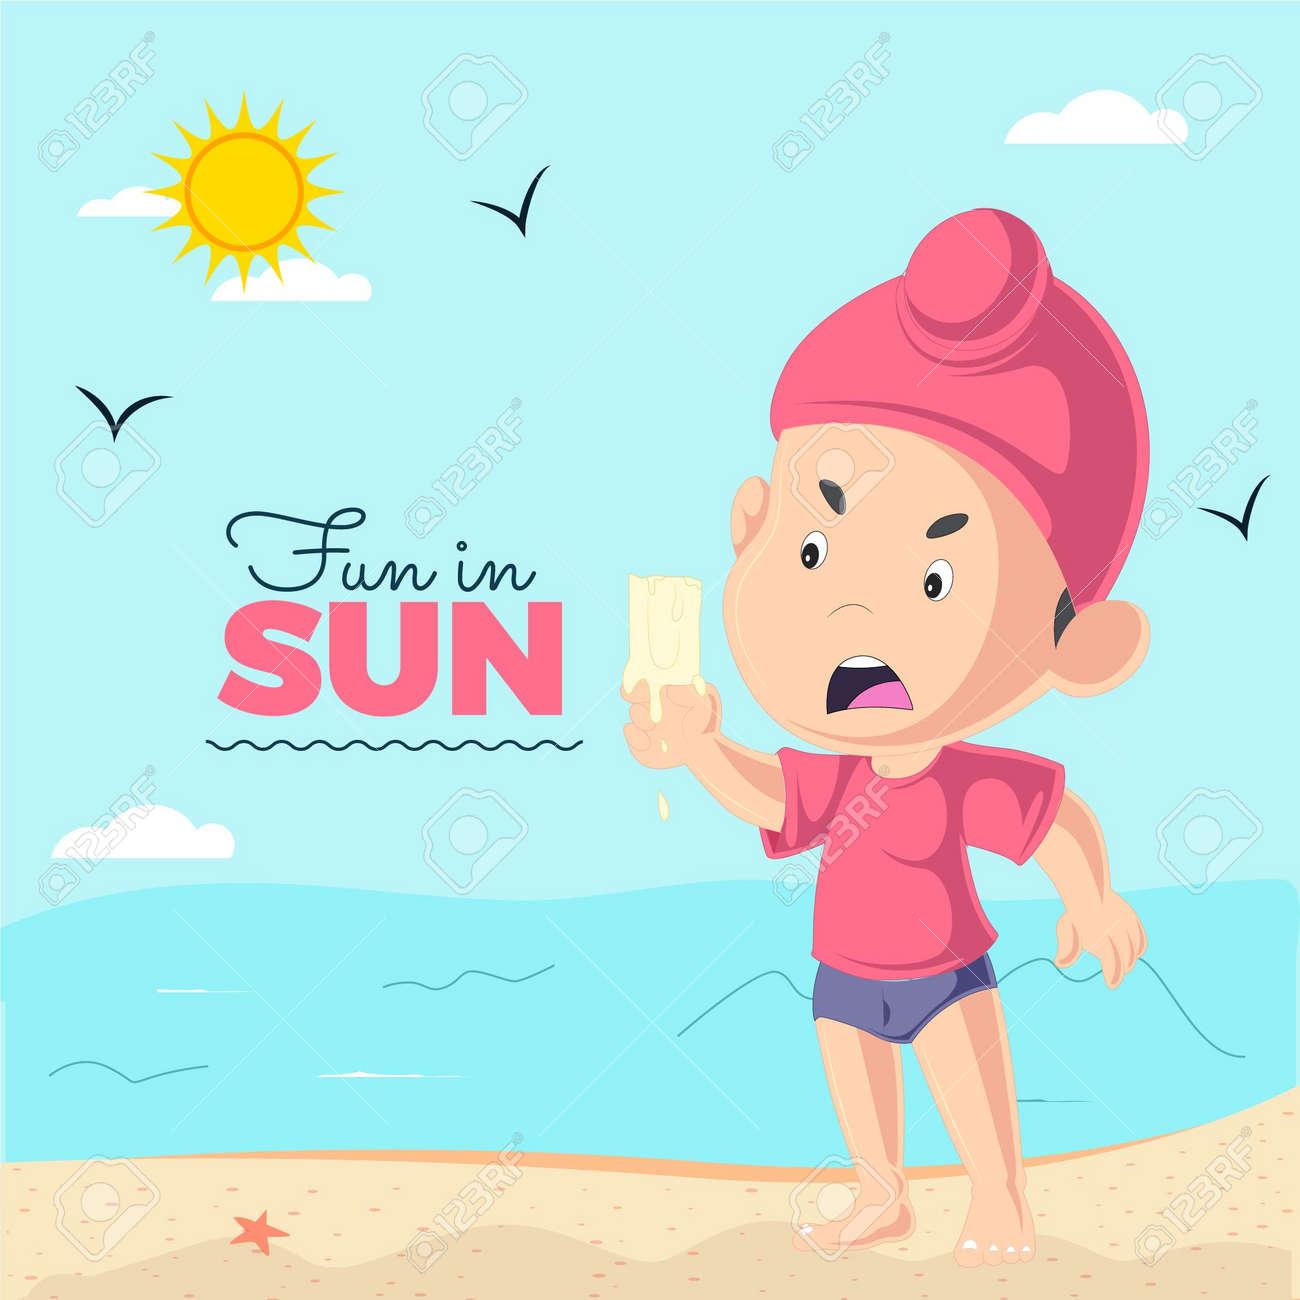 Fun in sun banner design with Punjabi kid ice cream is melting template. Vector graphic illustration. - 171727321